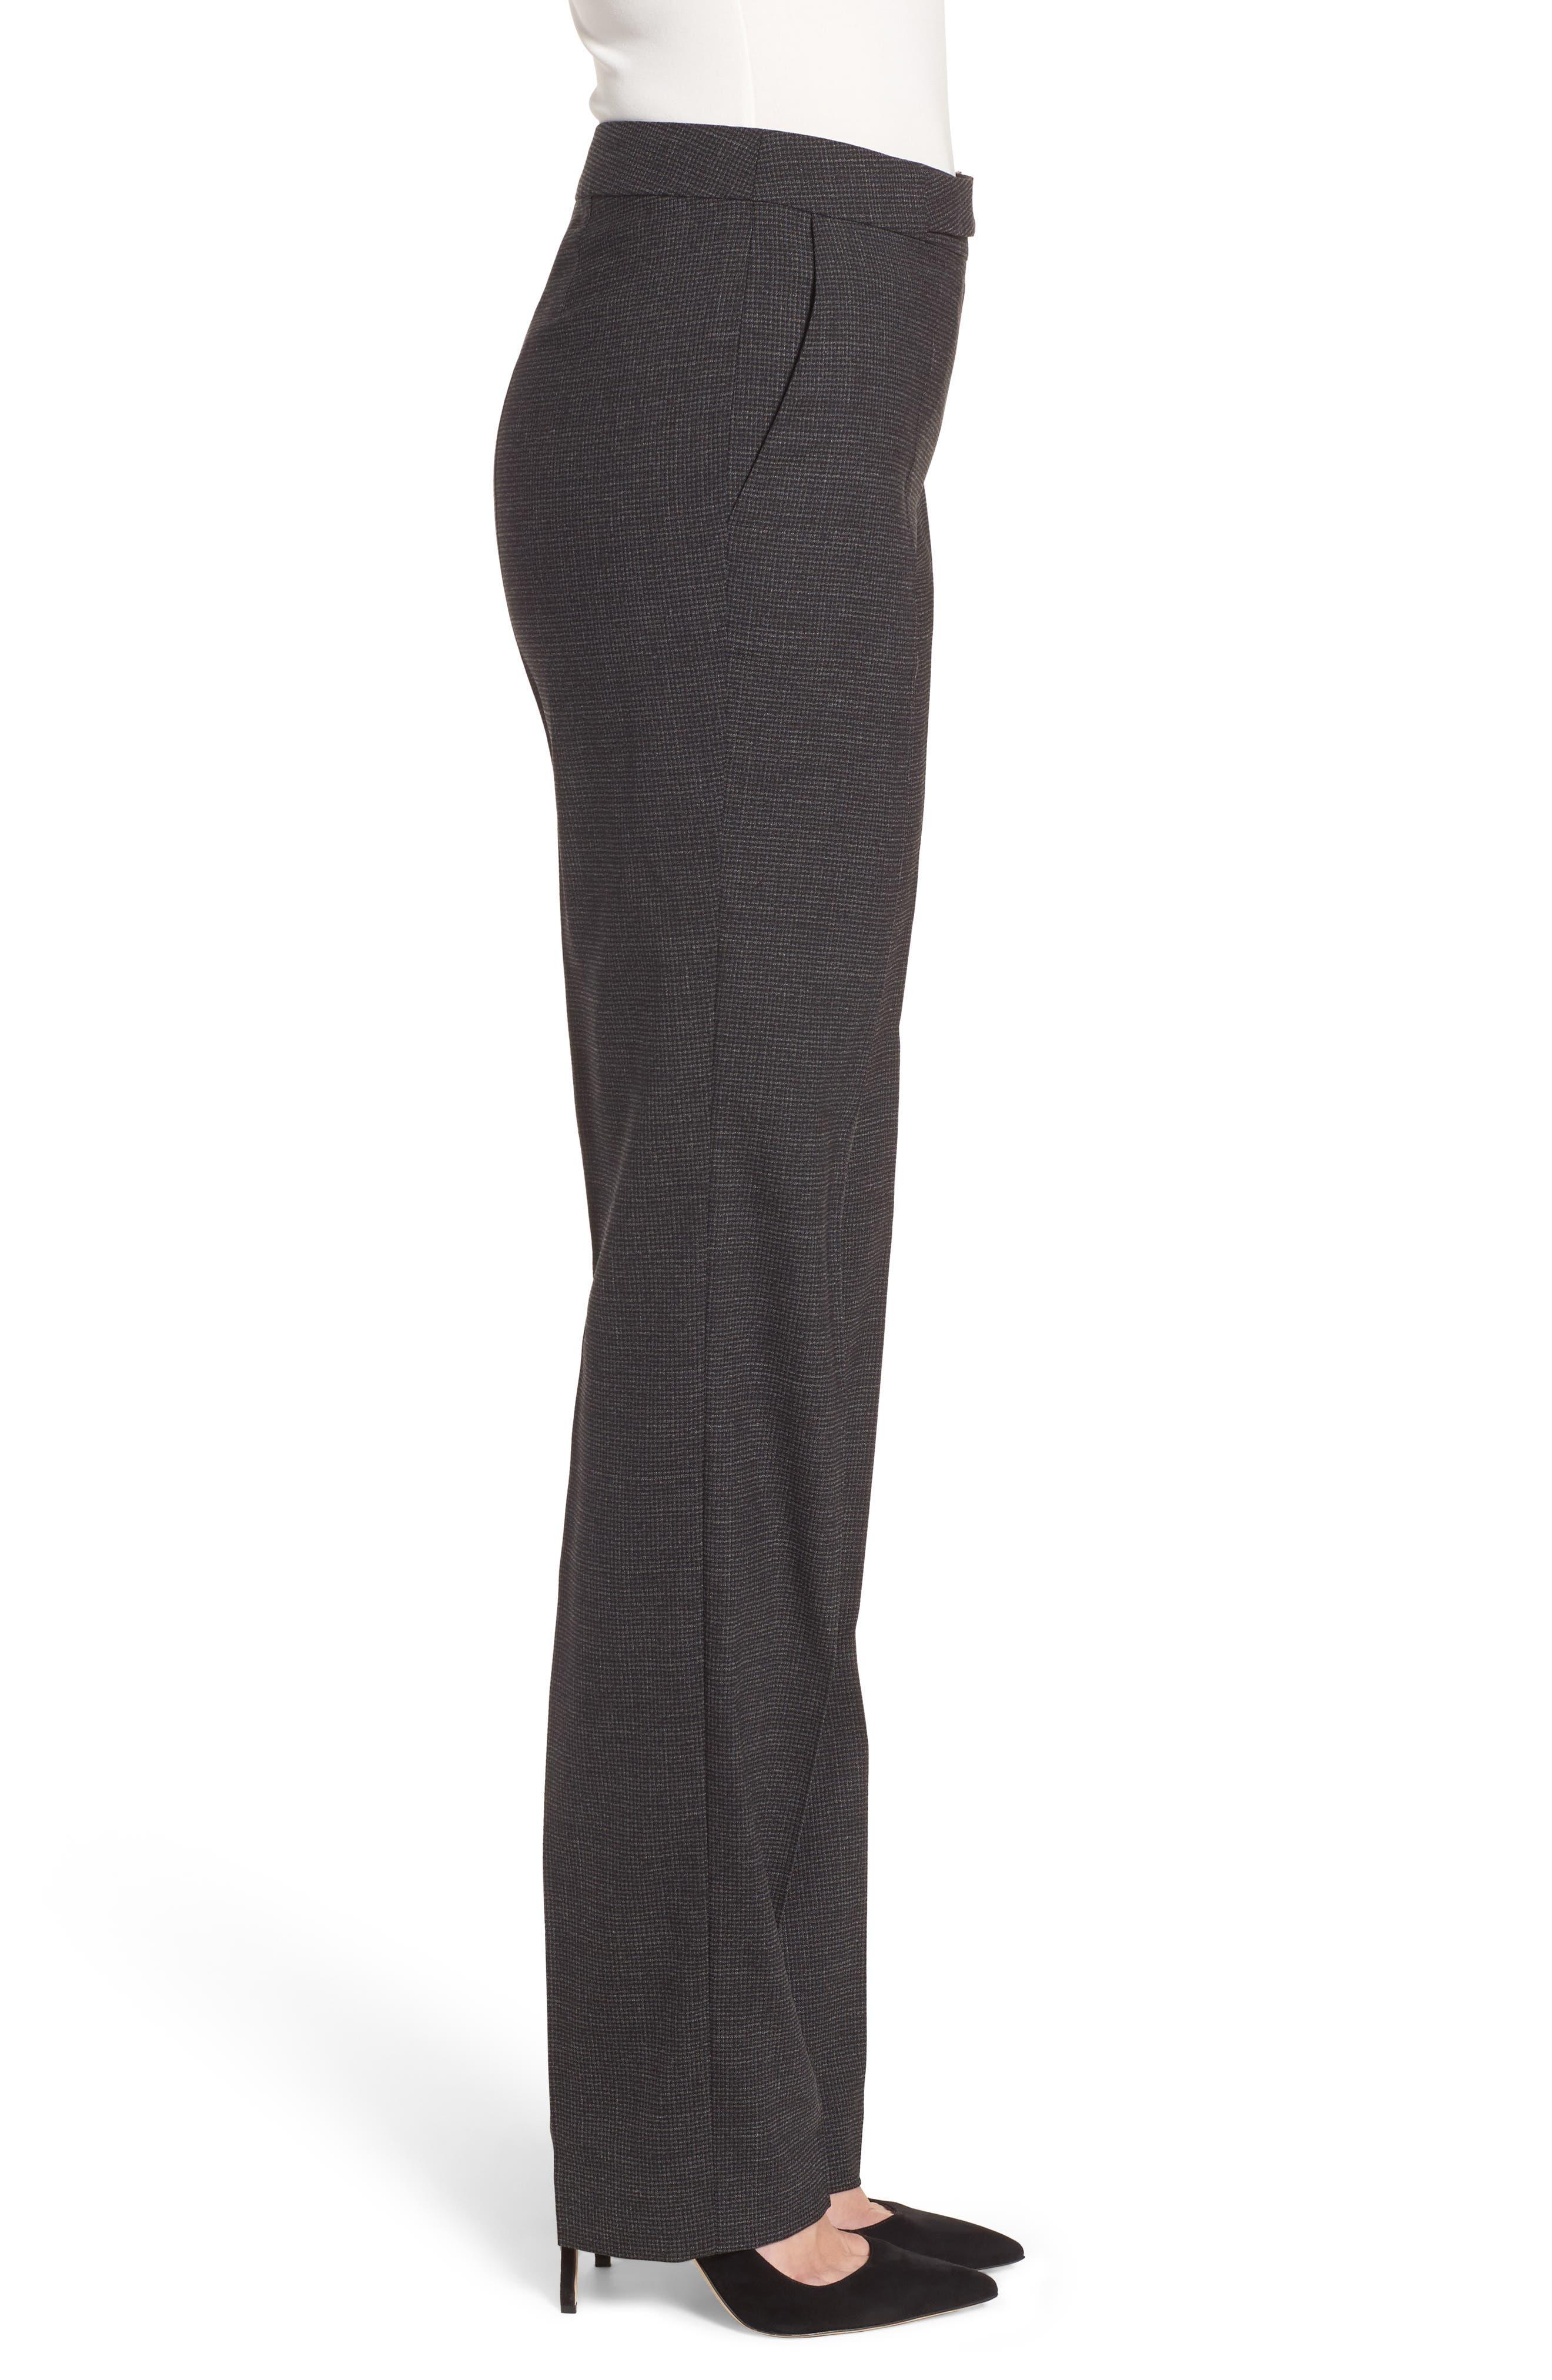 Tafena Check Stretch Wool Pants,                             Alternate thumbnail 3, color,                             006